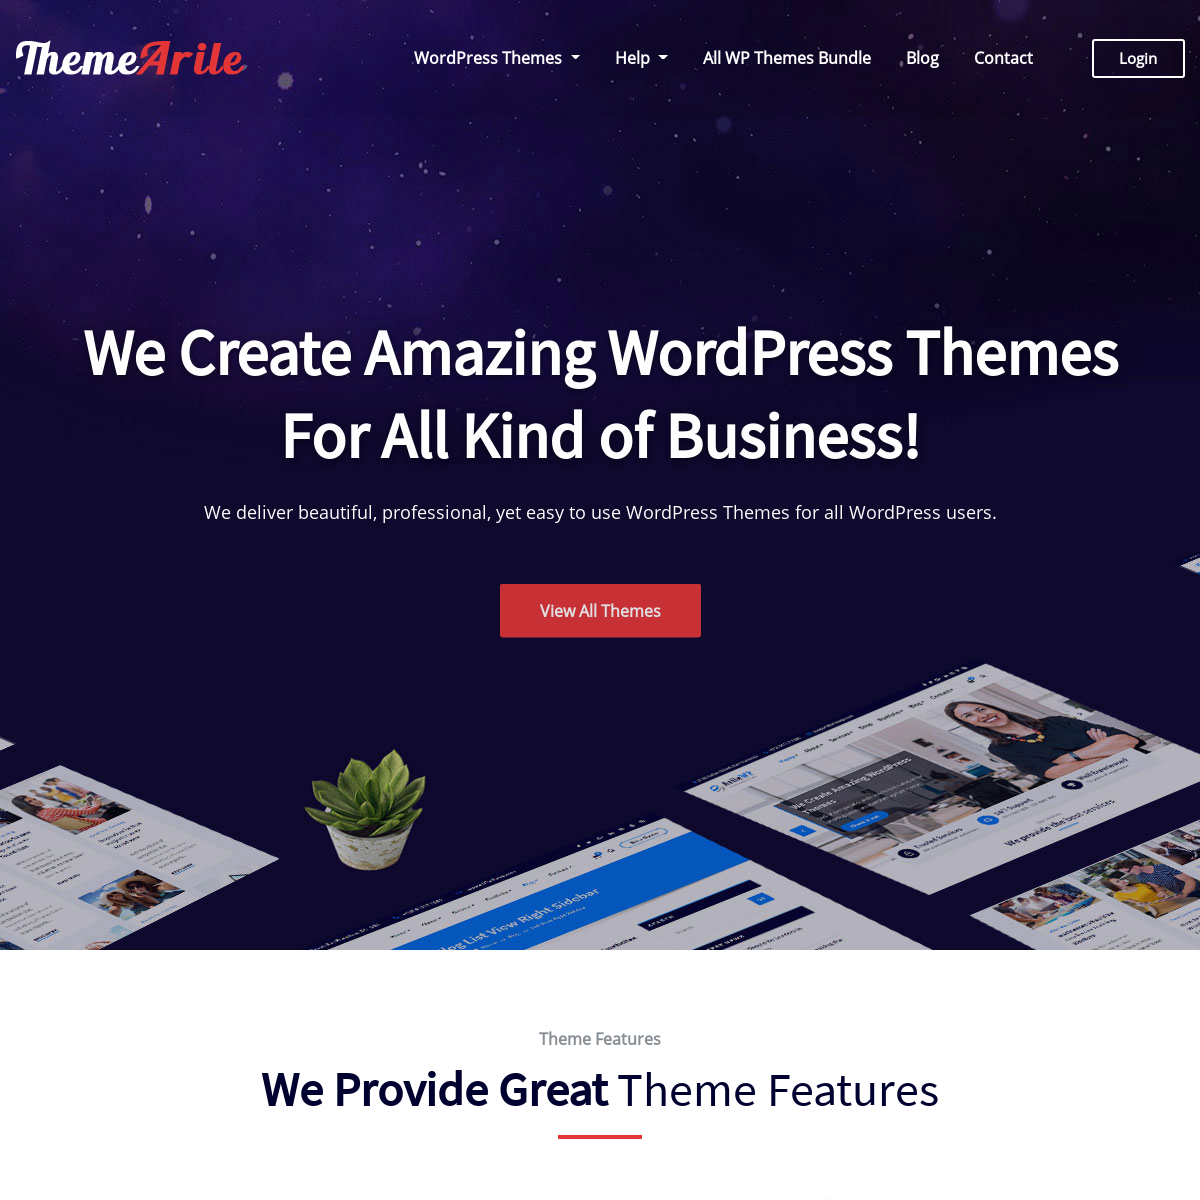 Premium WordPress Themes and Templates